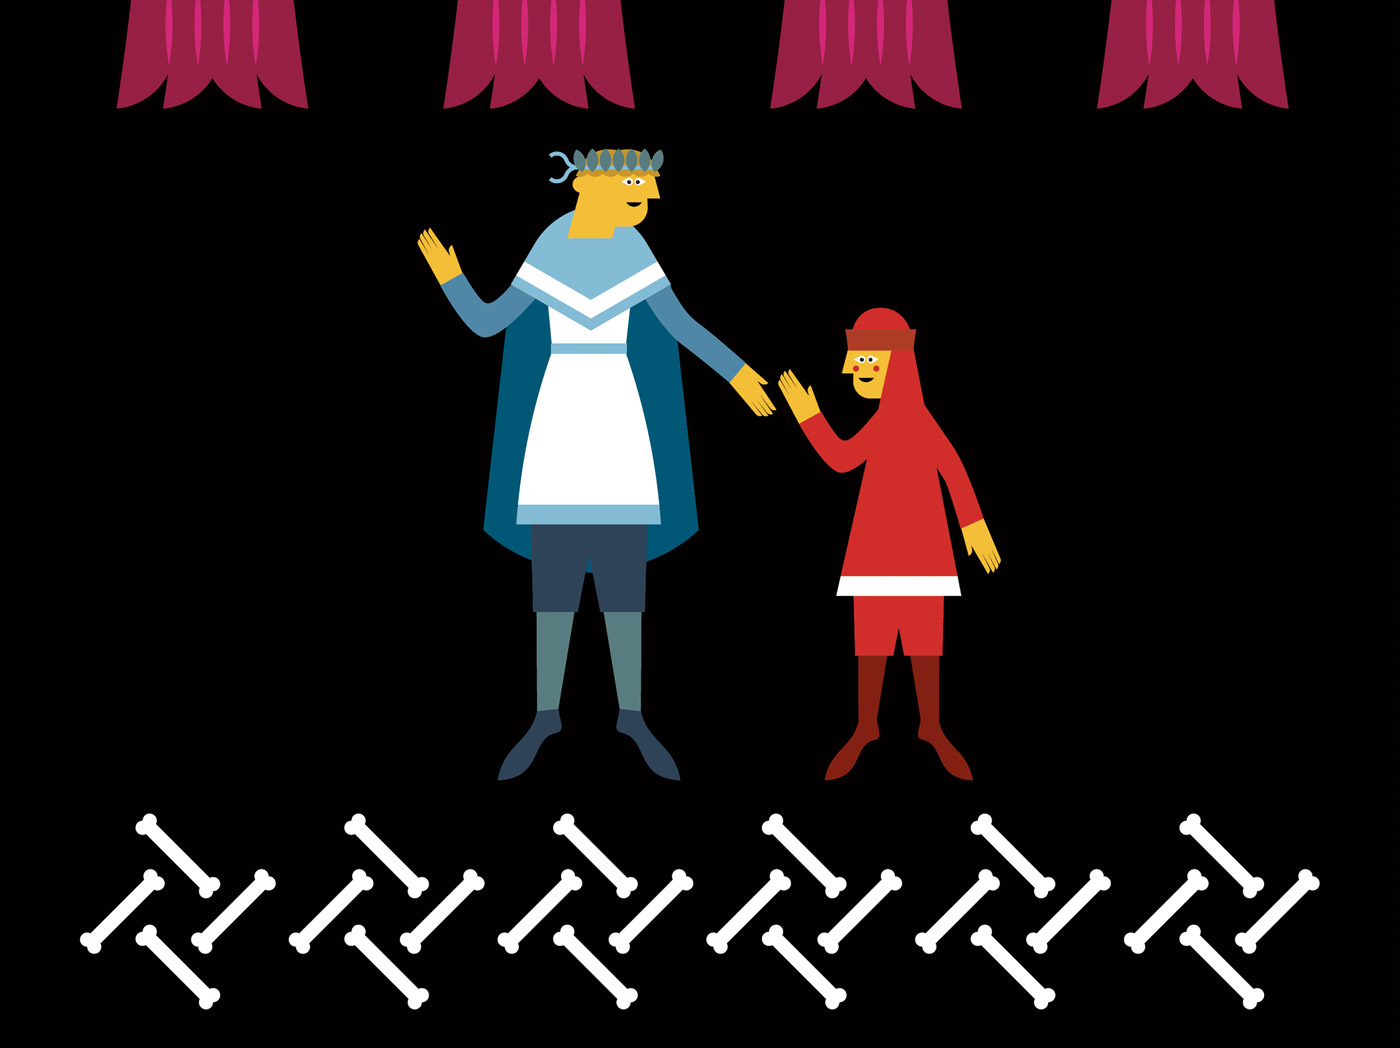 Dante ai bambini - Incontro con Virgilio